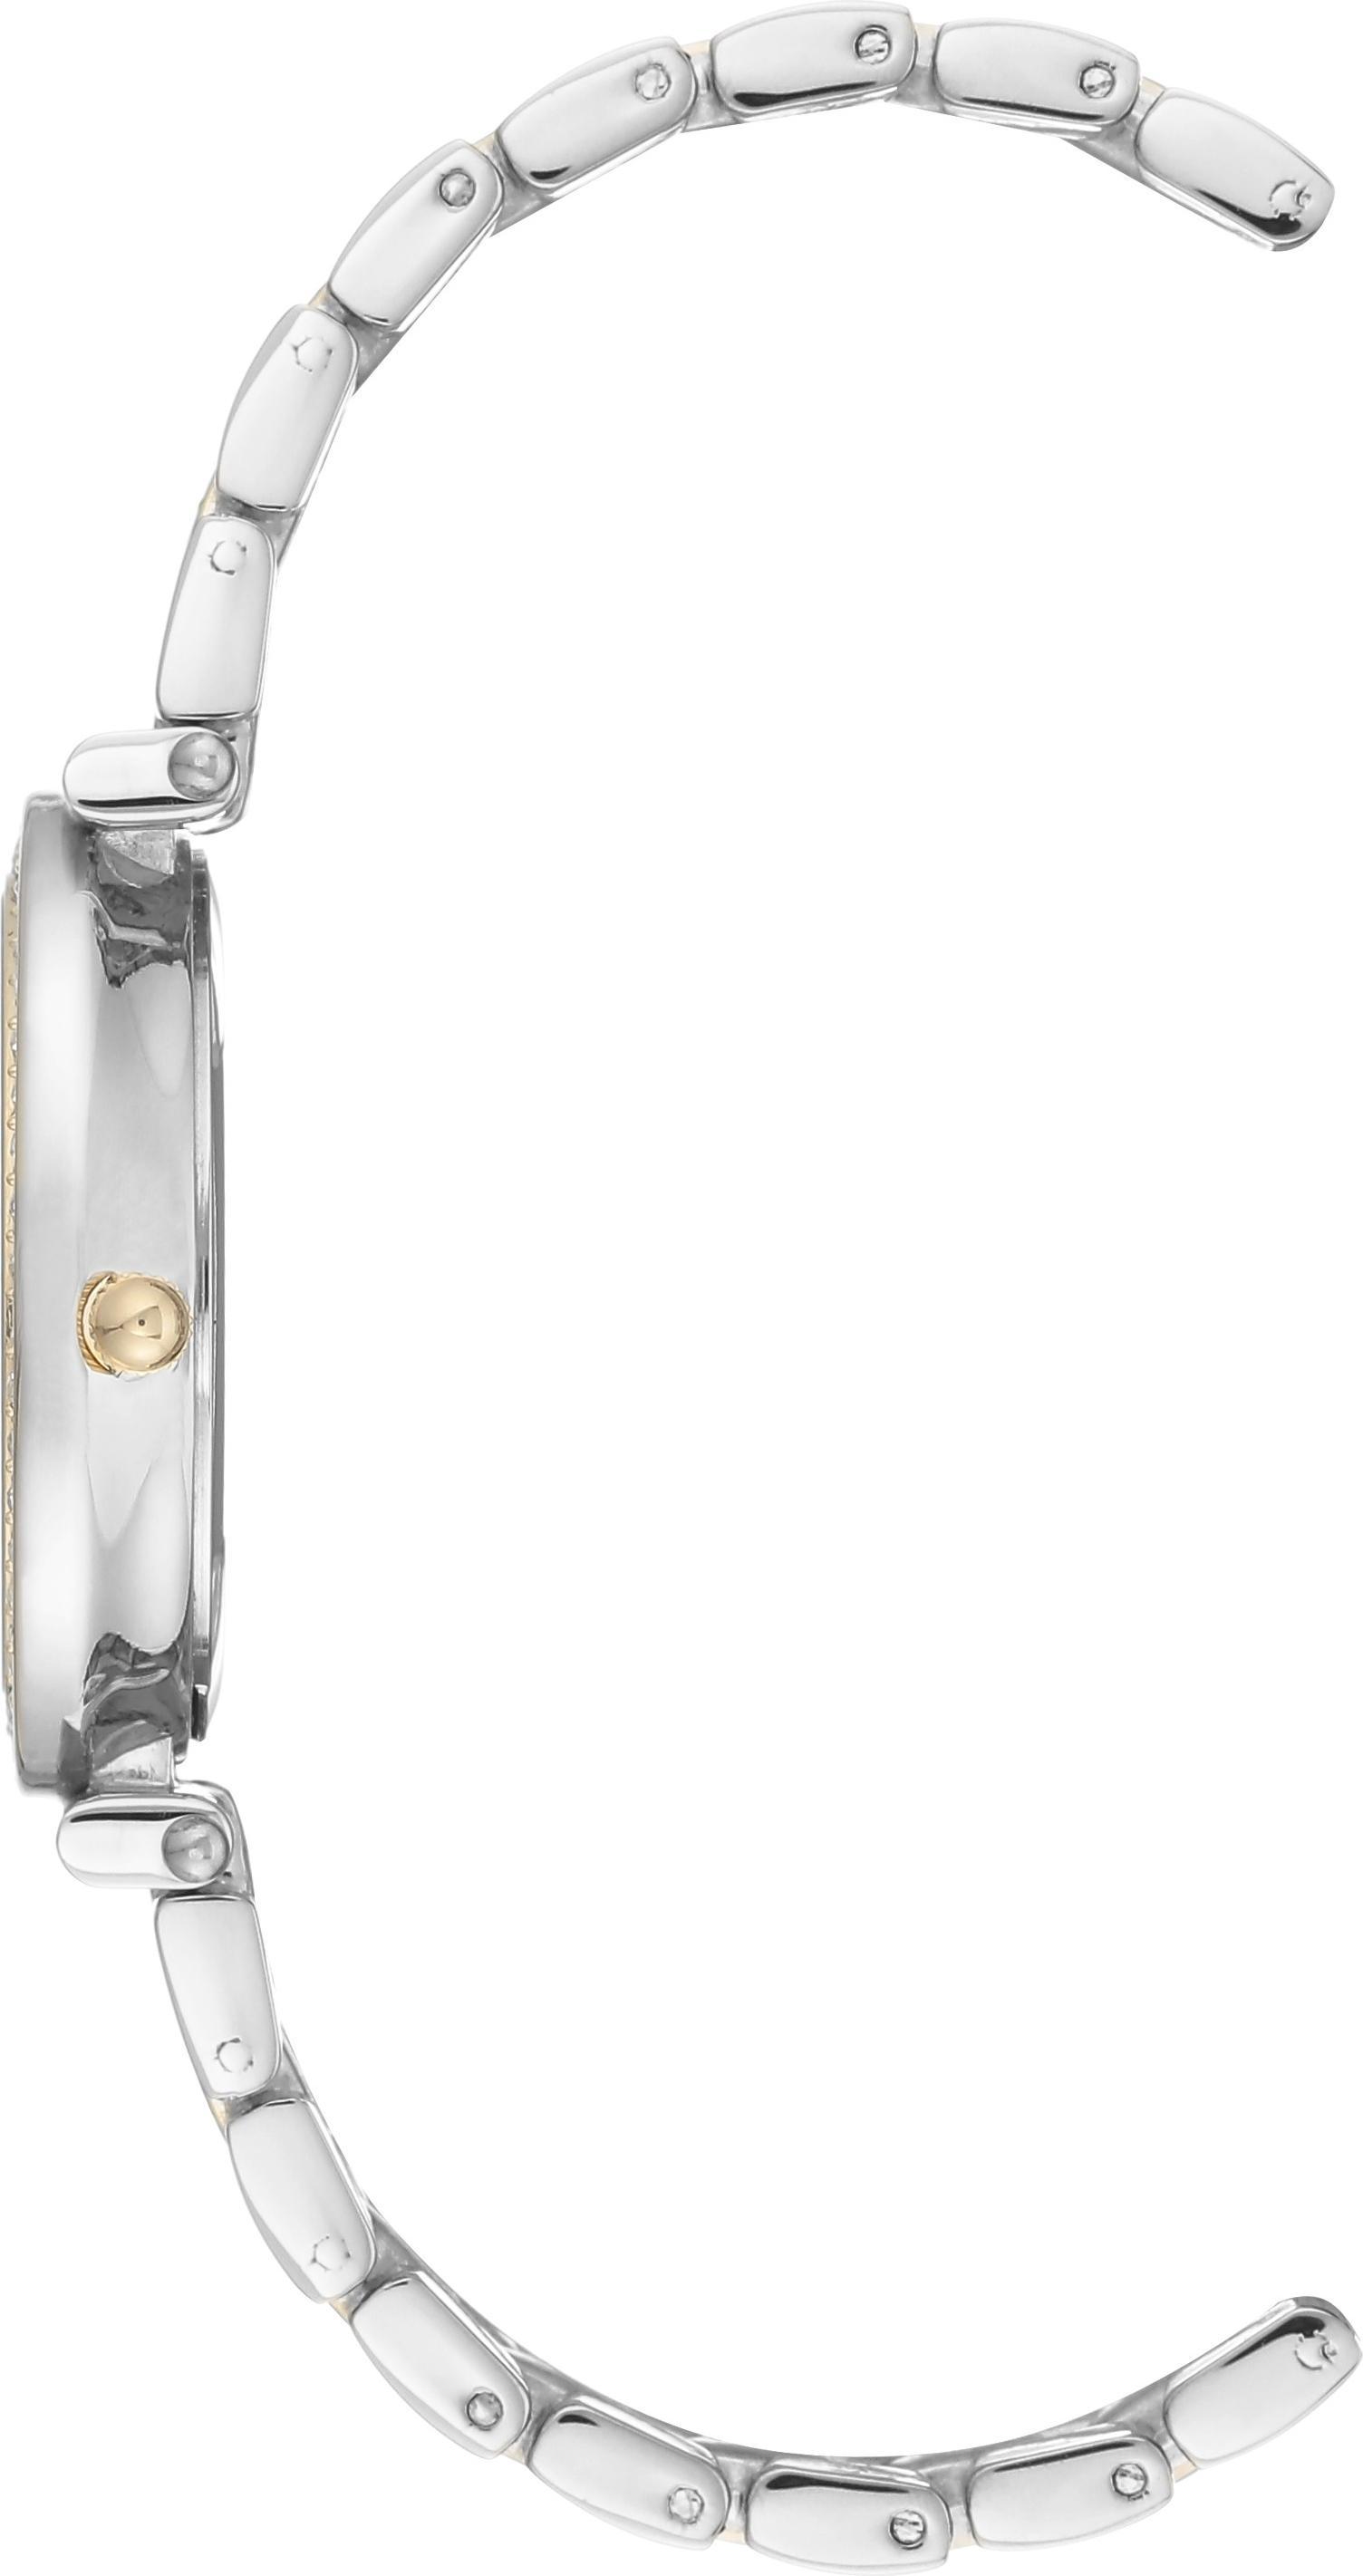 Đồng hồ thời trang nữ ANNE KLEIN 3409SVTT